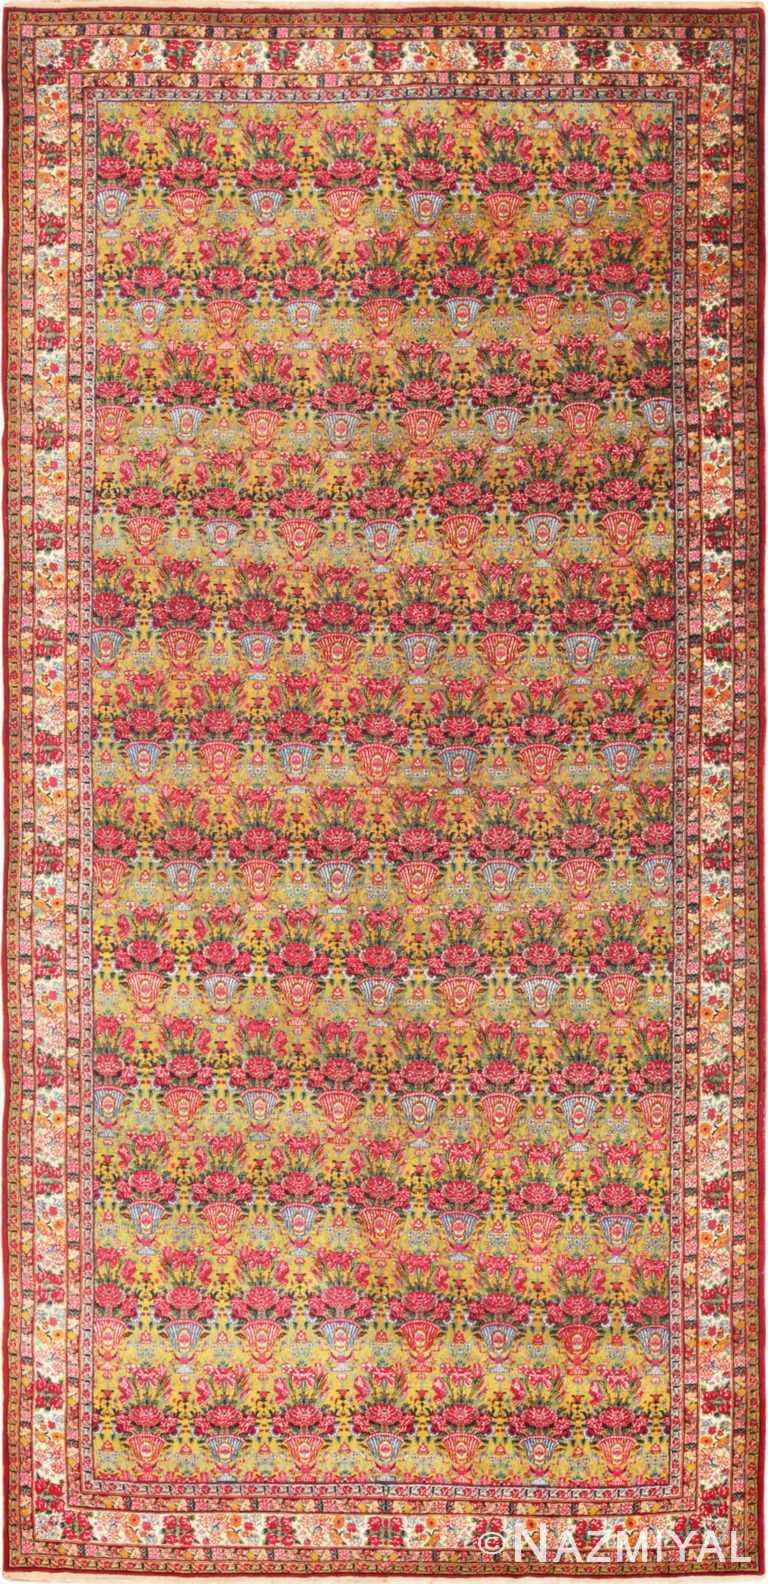 Full view Antique Persian Kerman rug 70166 by Nazmiyal